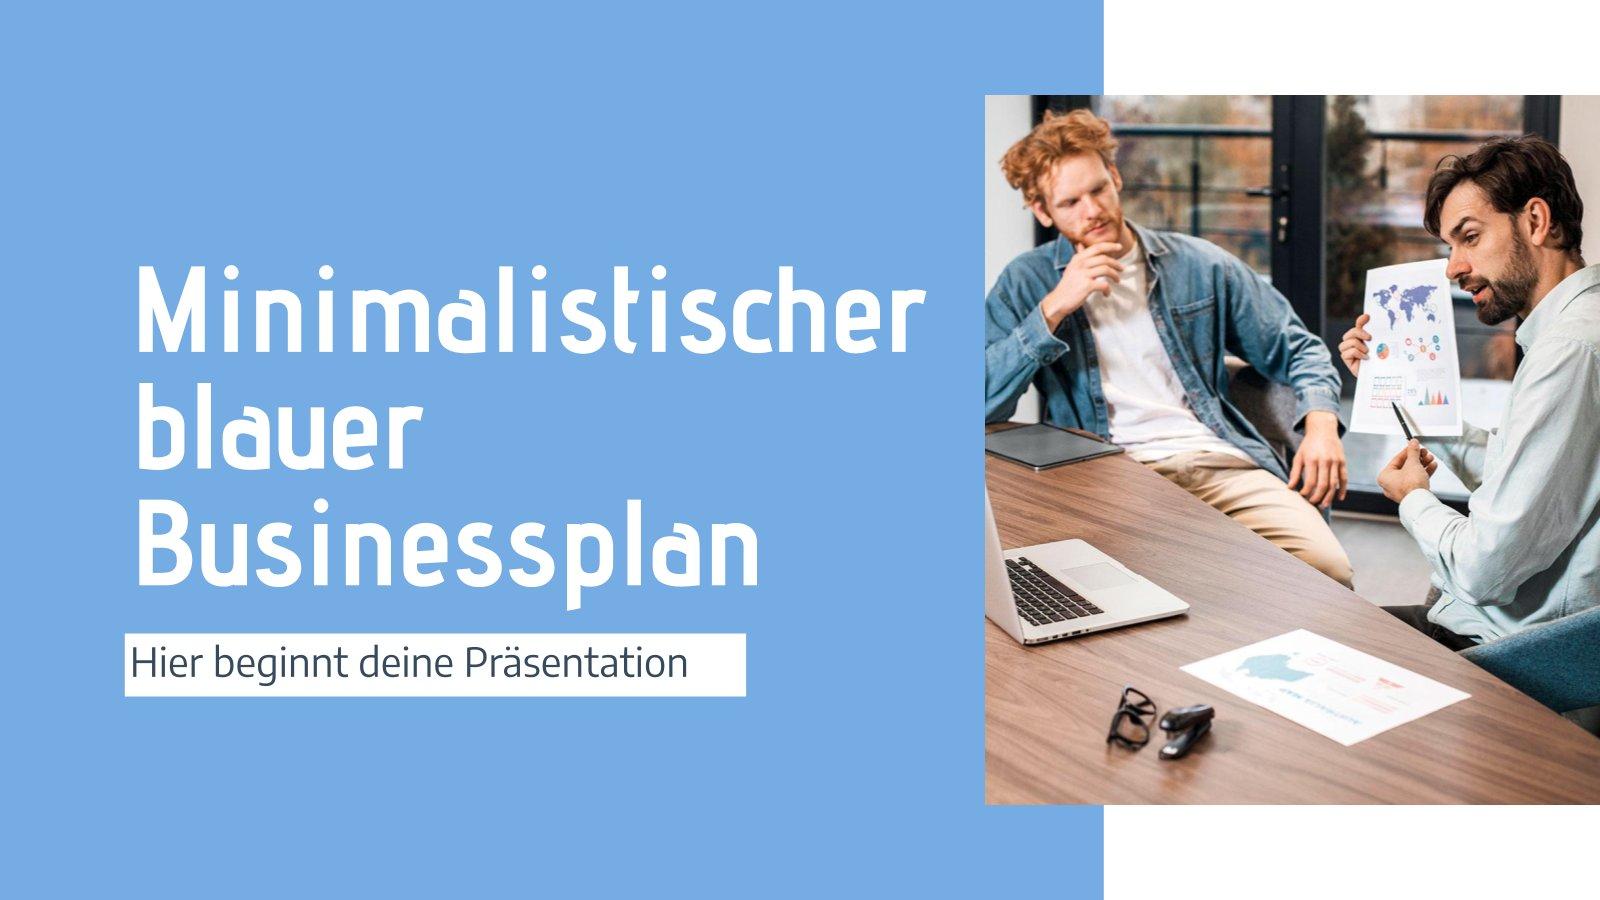 Minimalist Blue Business Plan presentation template